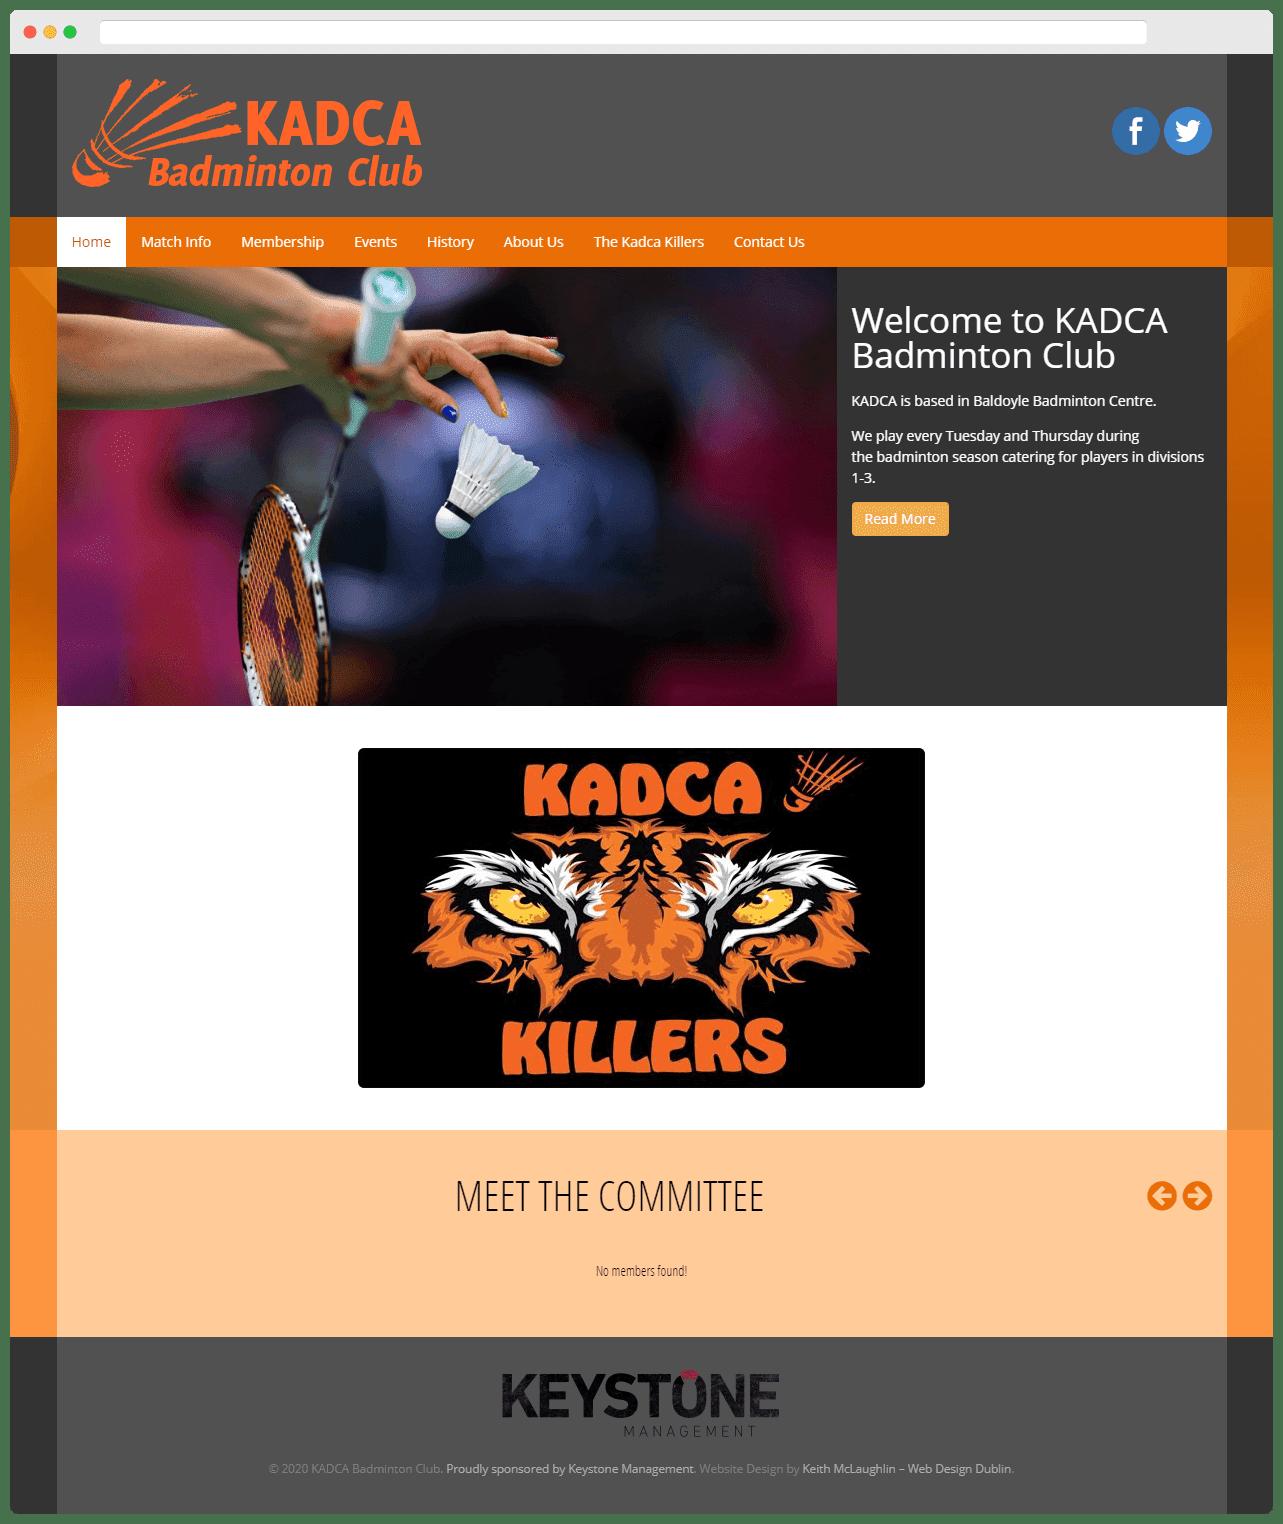 Kadca Badminton Club